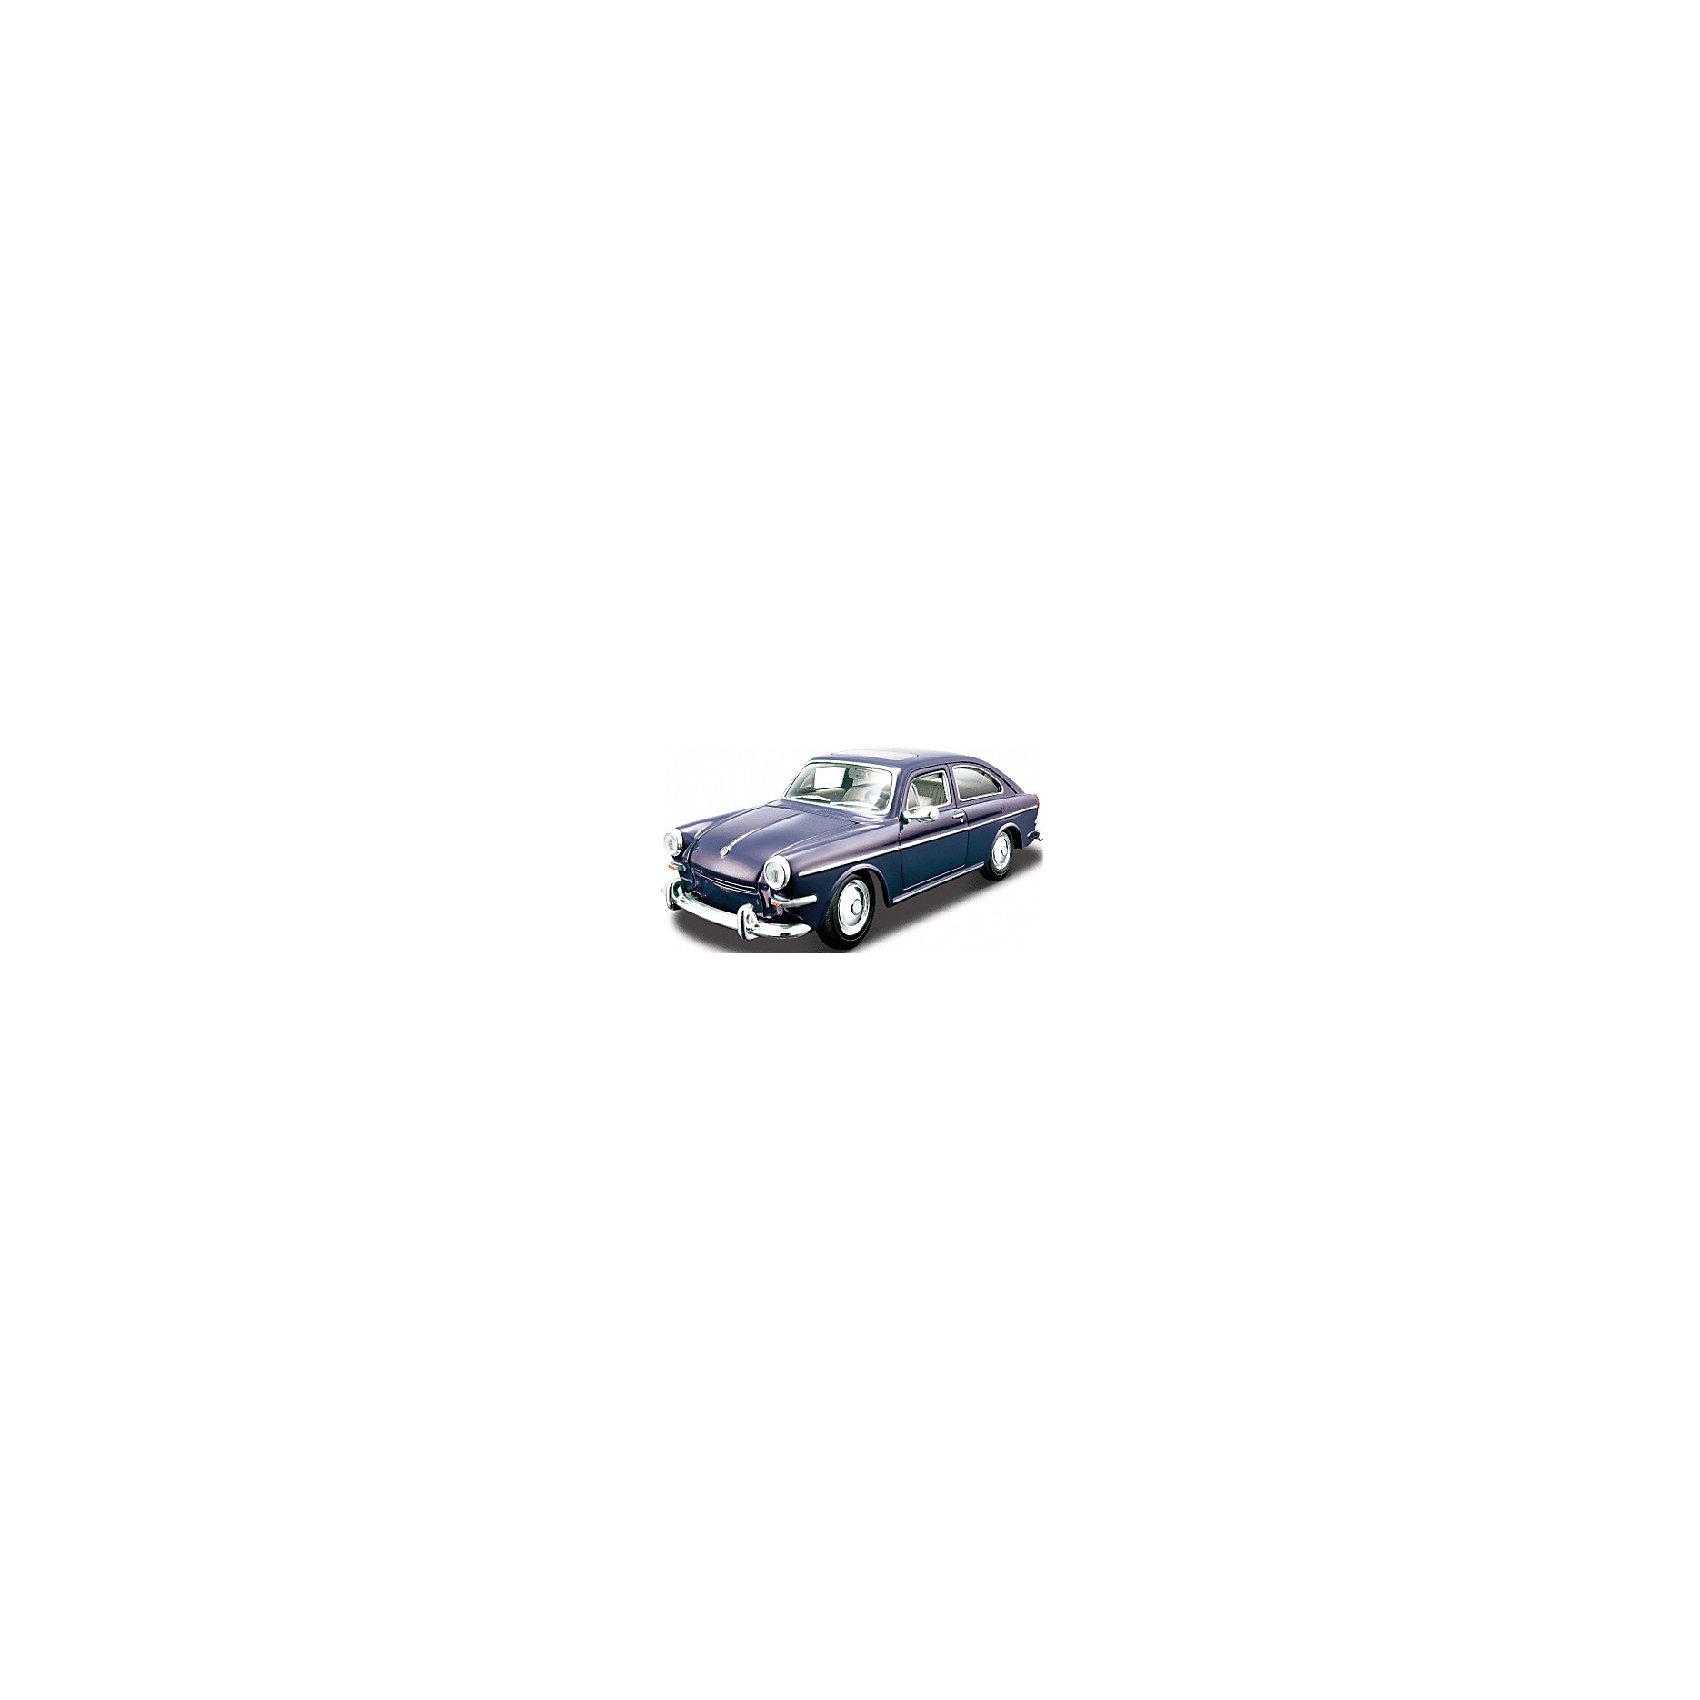 Maisto Фольксваген 1600 Fastback 1:24, Maisto фольксваген пассат б3 универсал в луганске